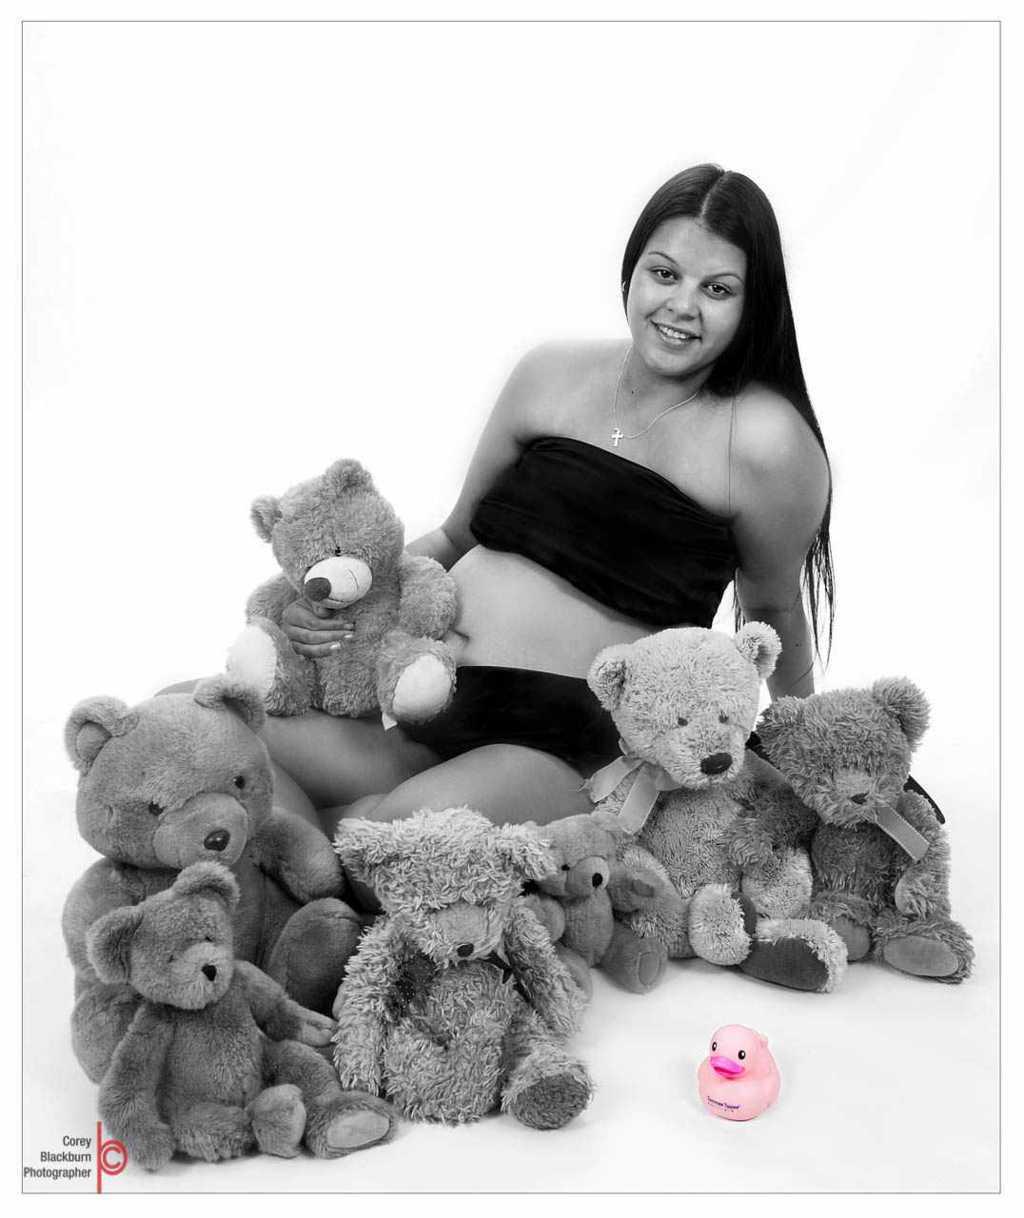 Pregnancy 21 - Corey Blackburn Photographer - Weddings | Pregnancy | Newborn | Portrait | Fine Art | Commercial | Journalism